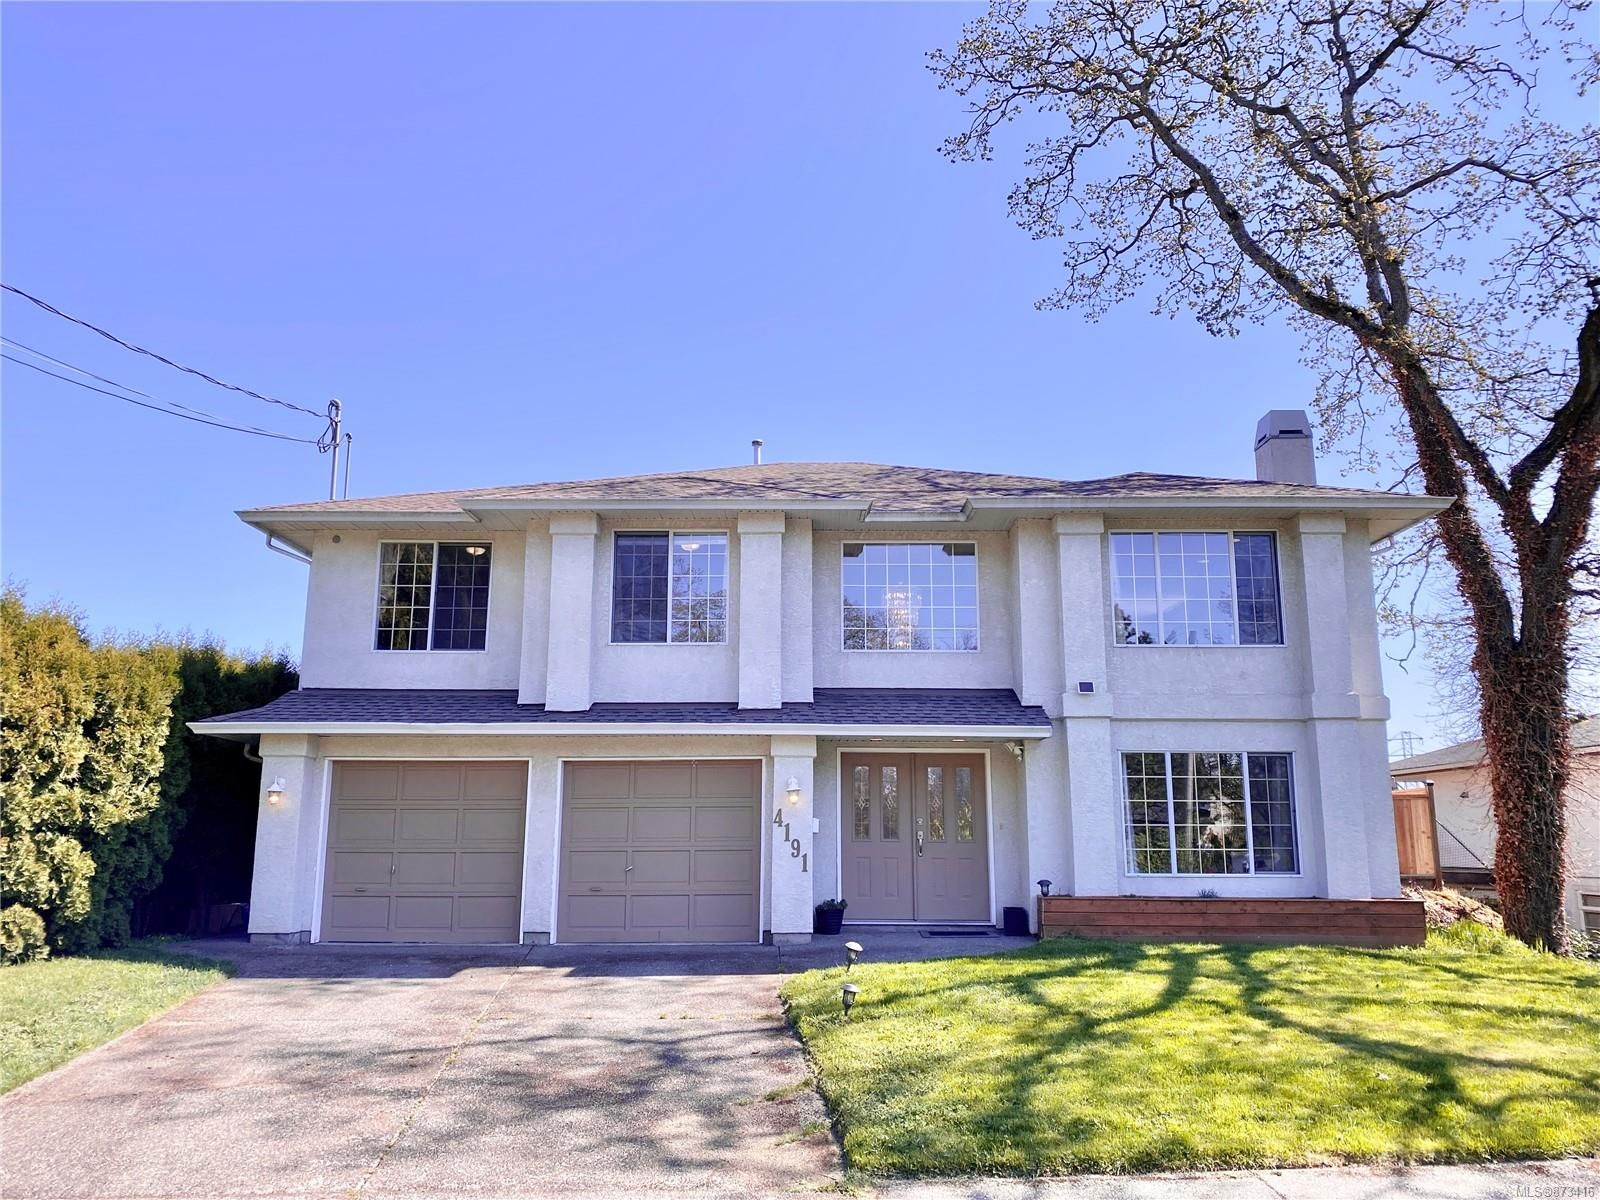 Main Photo: 4191 Quadra St in : SE Lake Hill House for sale (Saanich East)  : MLS®# 873416